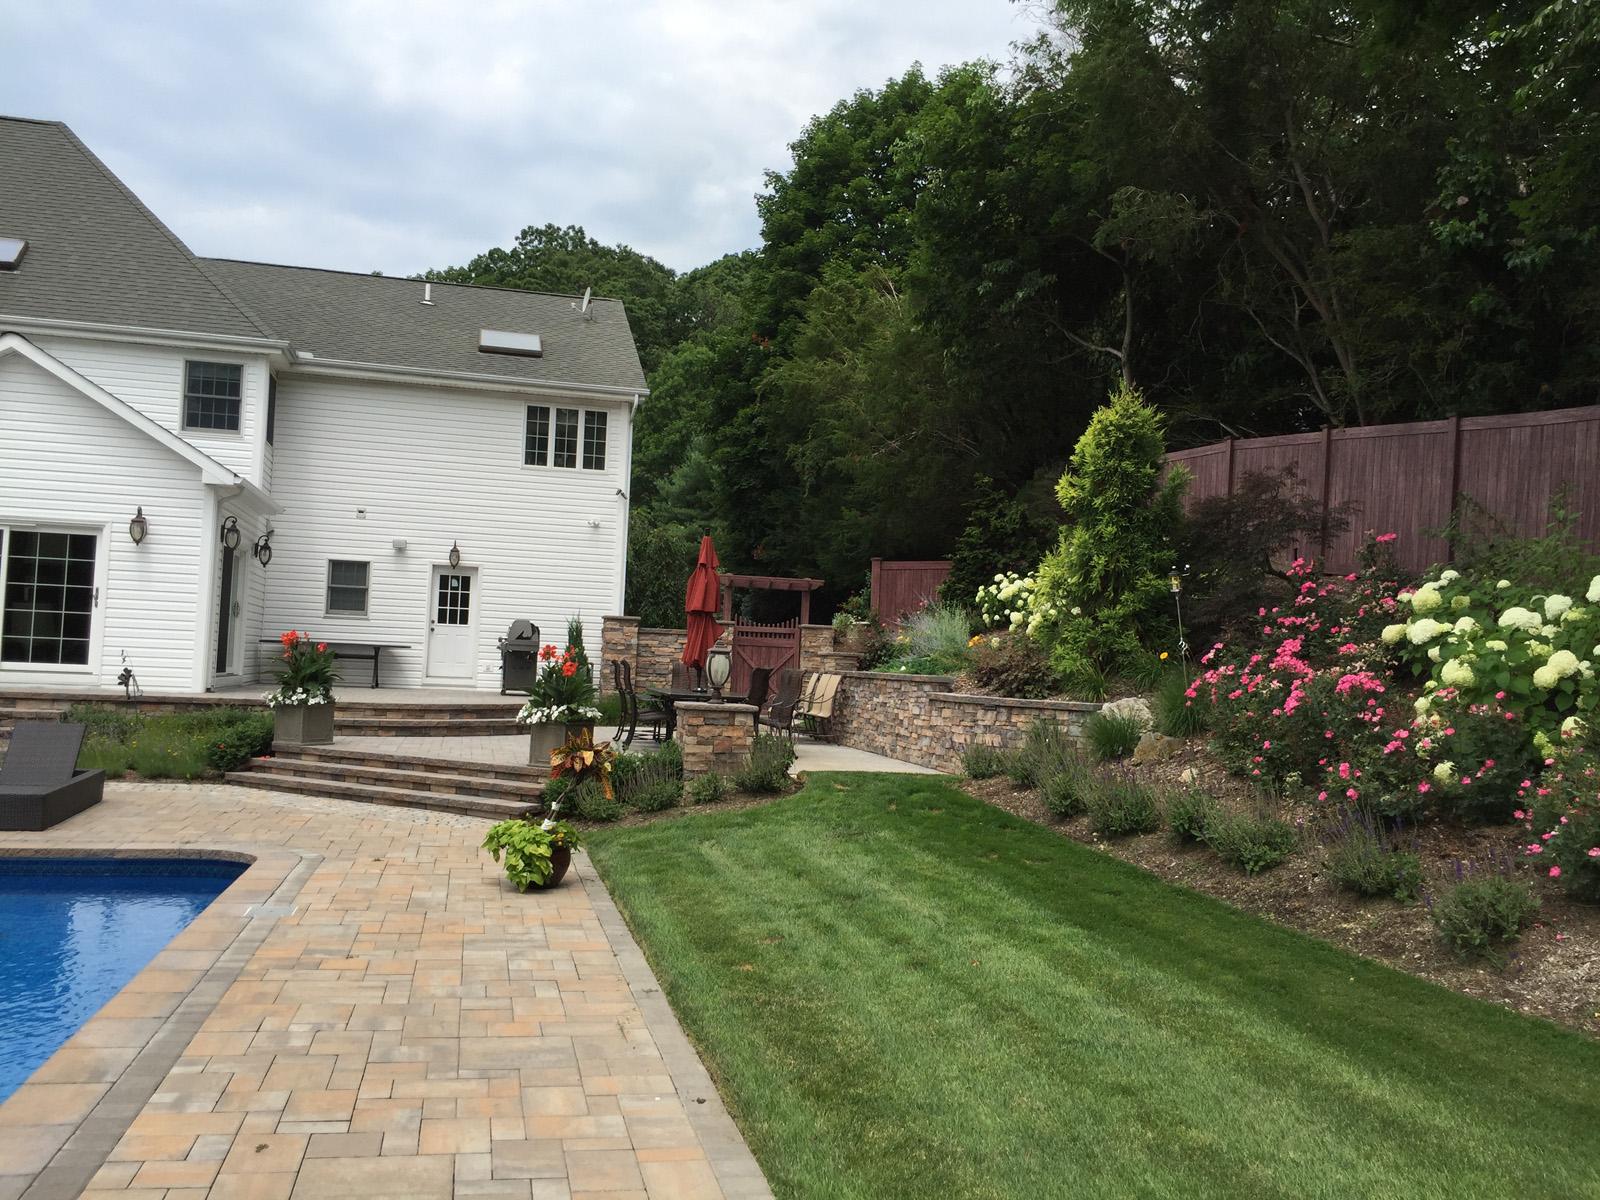 Professional landscape design with plantingsin Long Island, NY